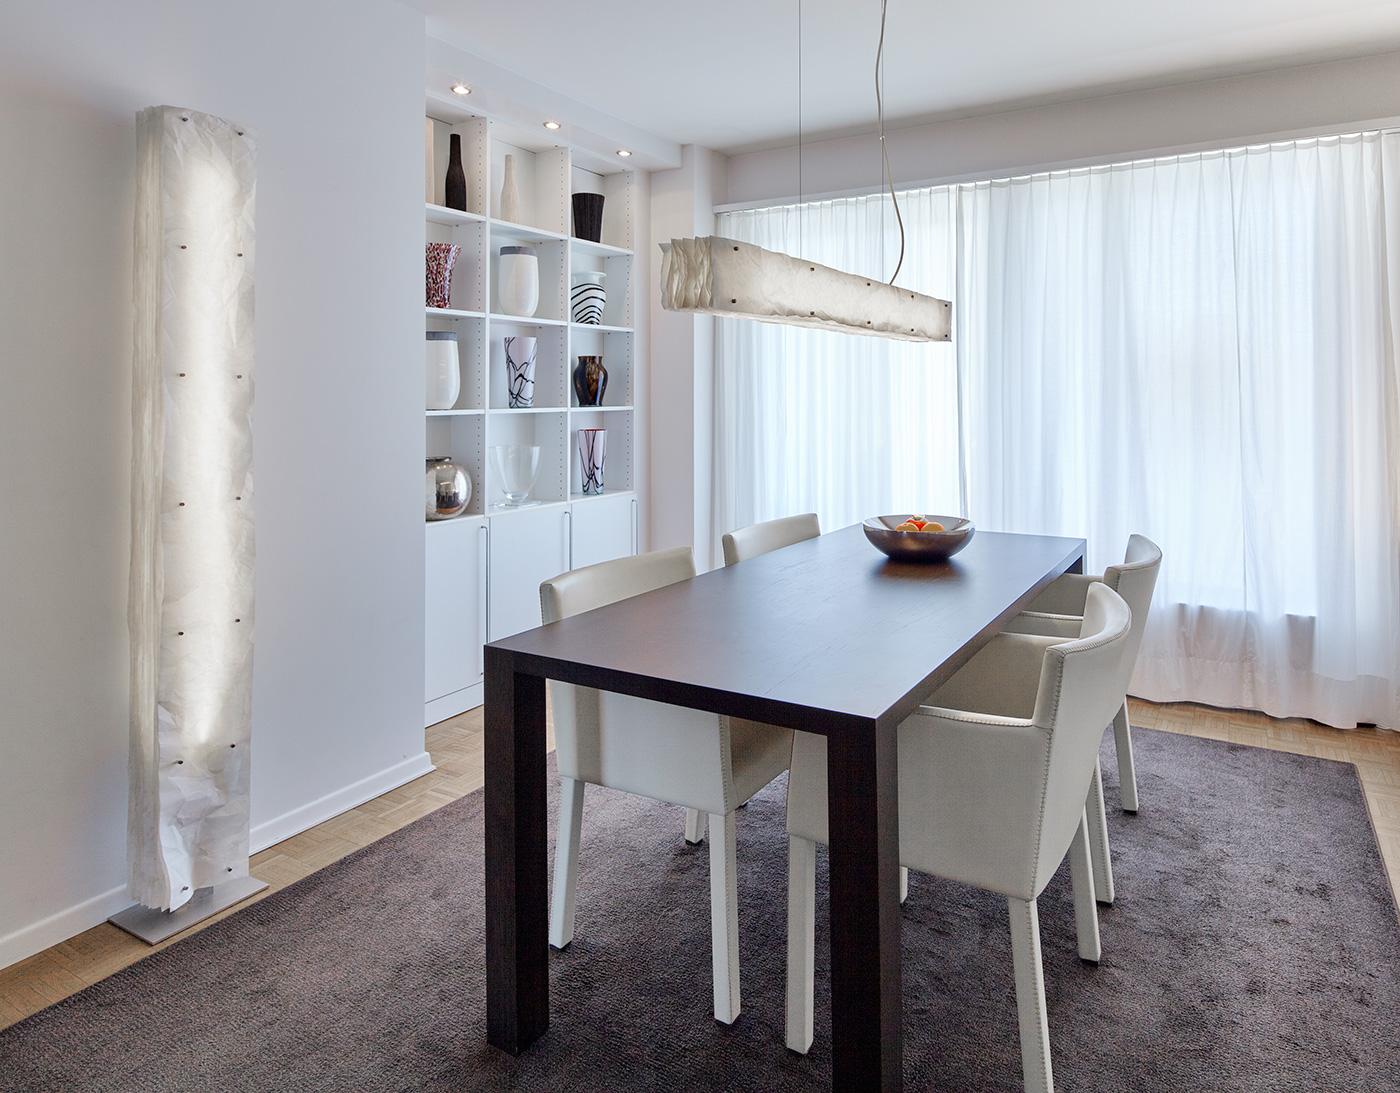 5,5-Room Apartment Höngg Dining